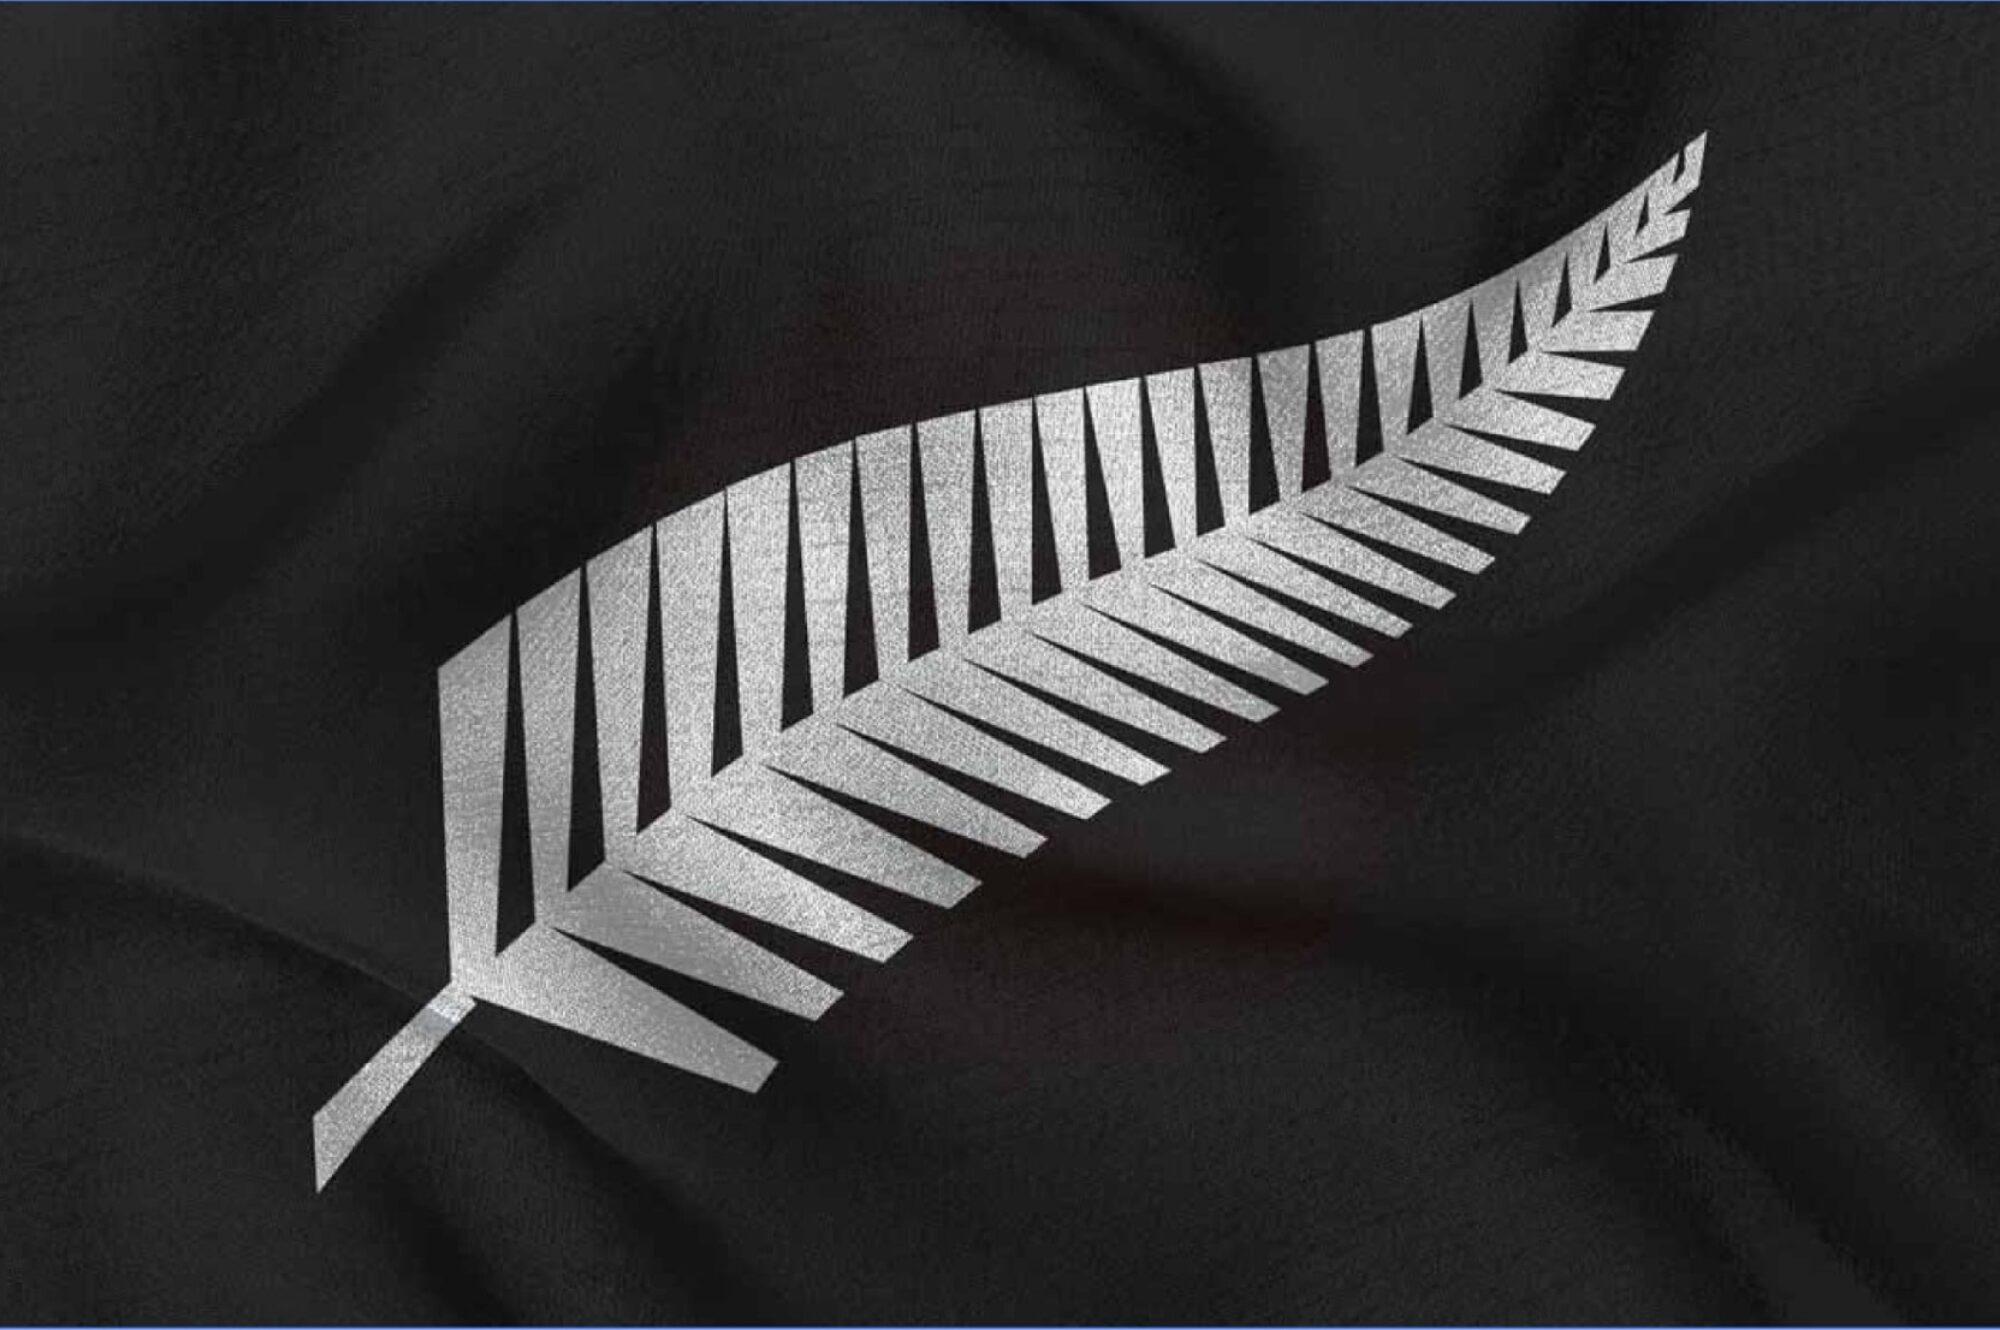 All Blacks Silverfern Brand Logo